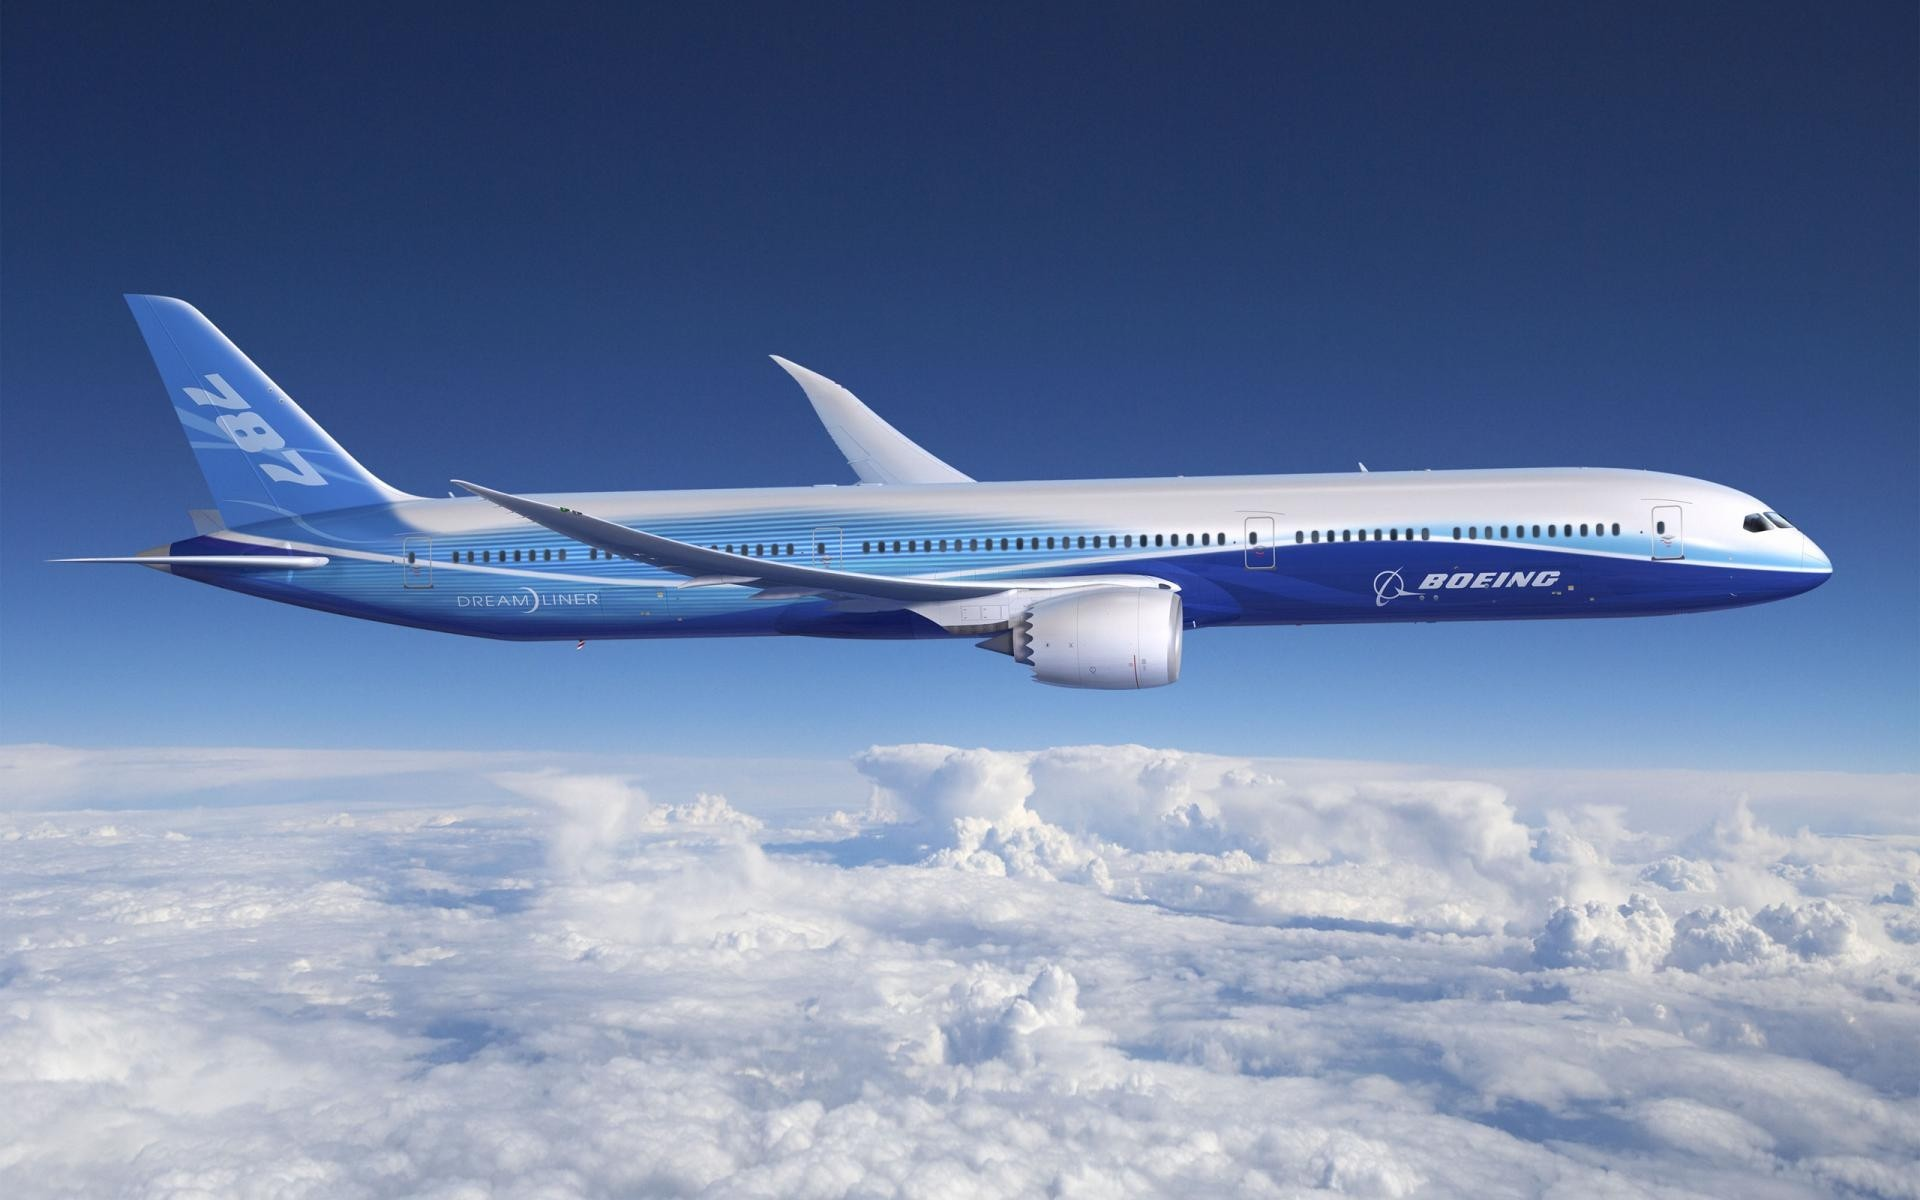 Boeing 787 Dreamliner - 1920x1200